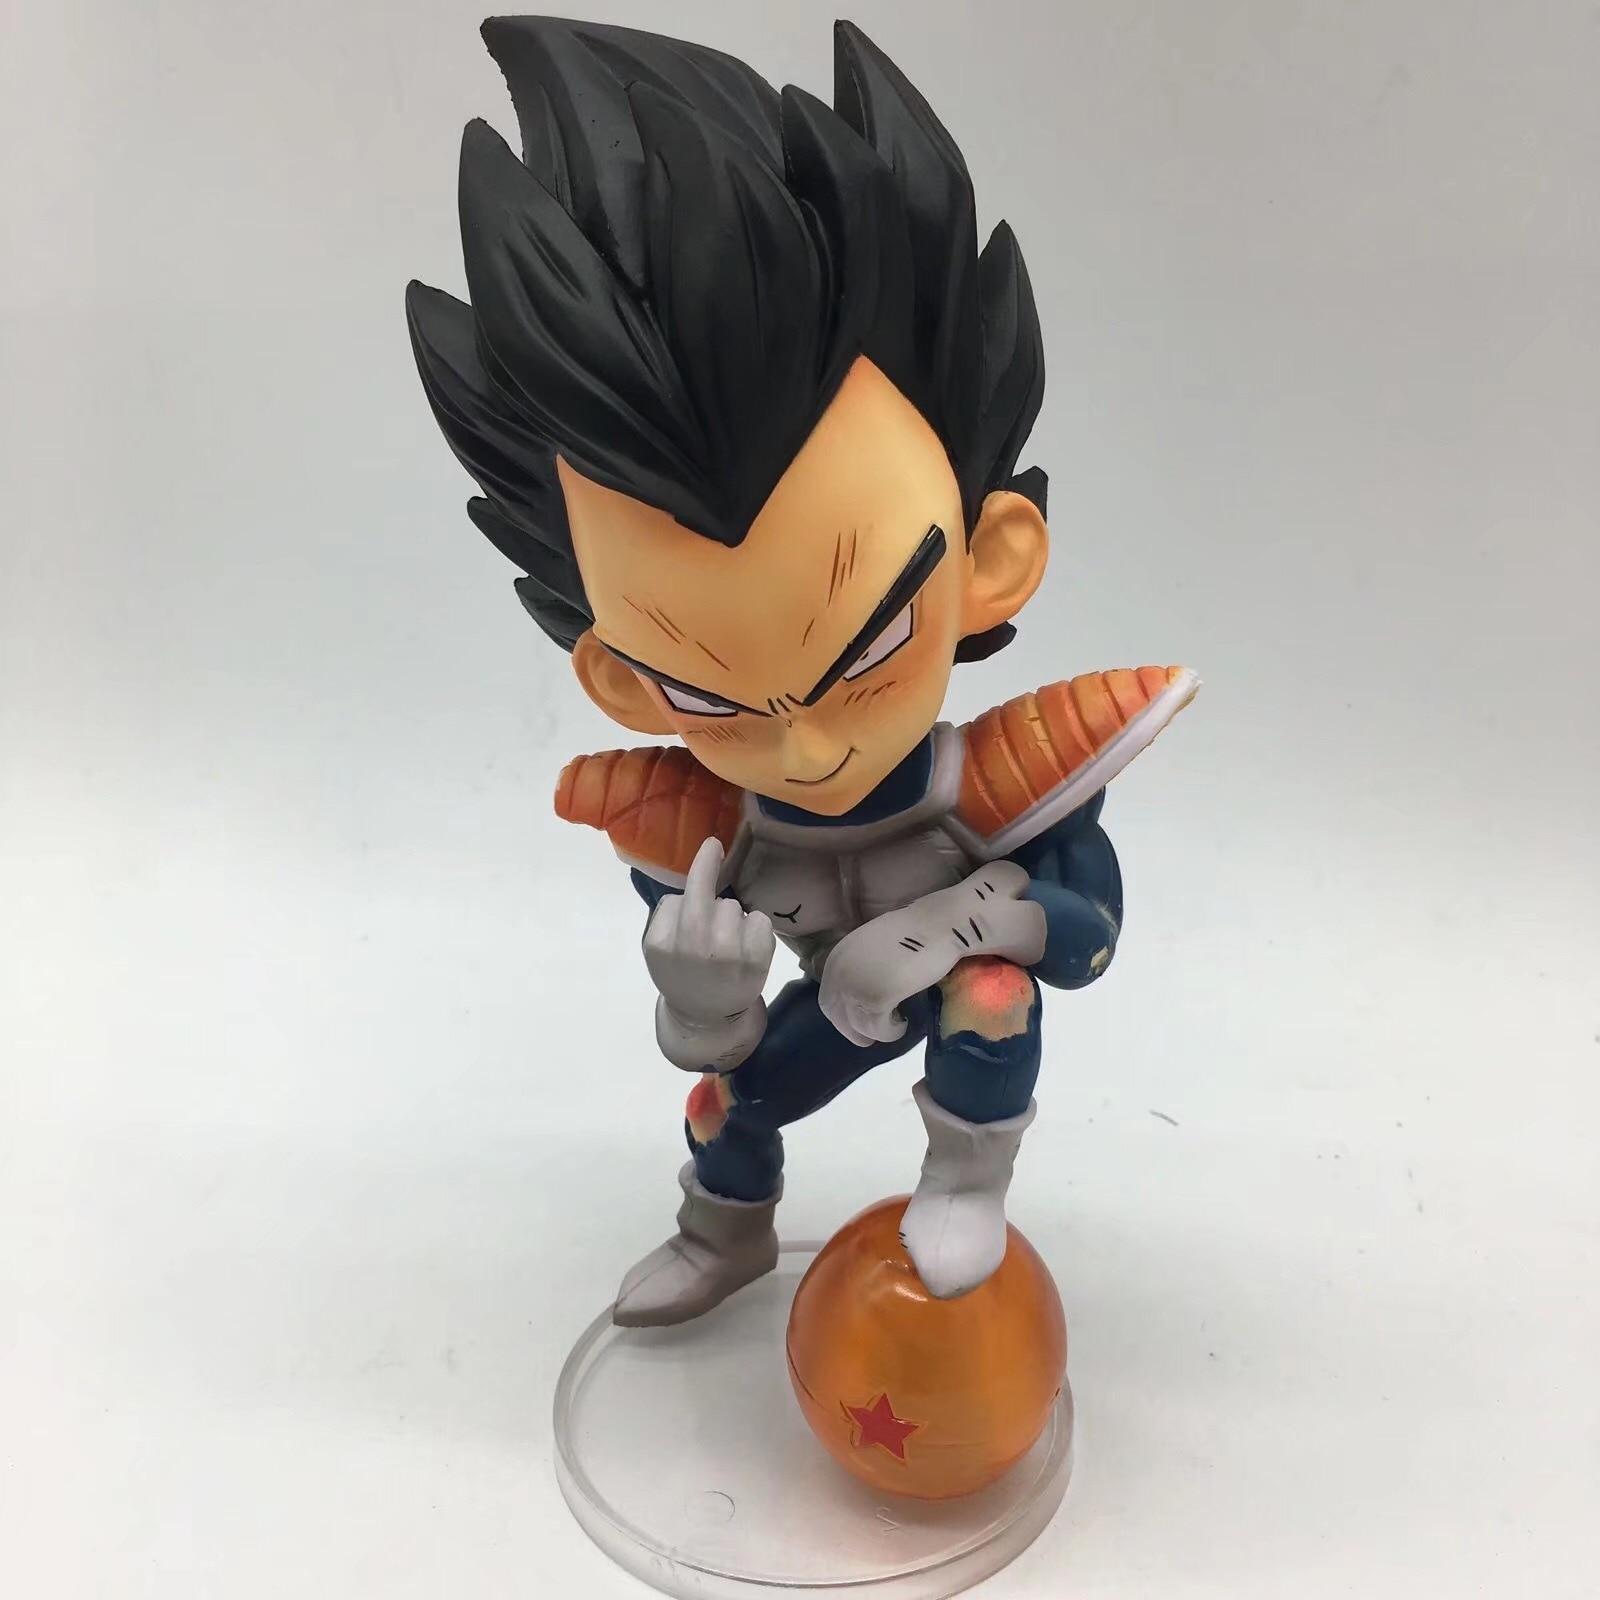 Dragon Ball Z Vegeta Funny Middle Finger Super Saiyan Figure Model Toys